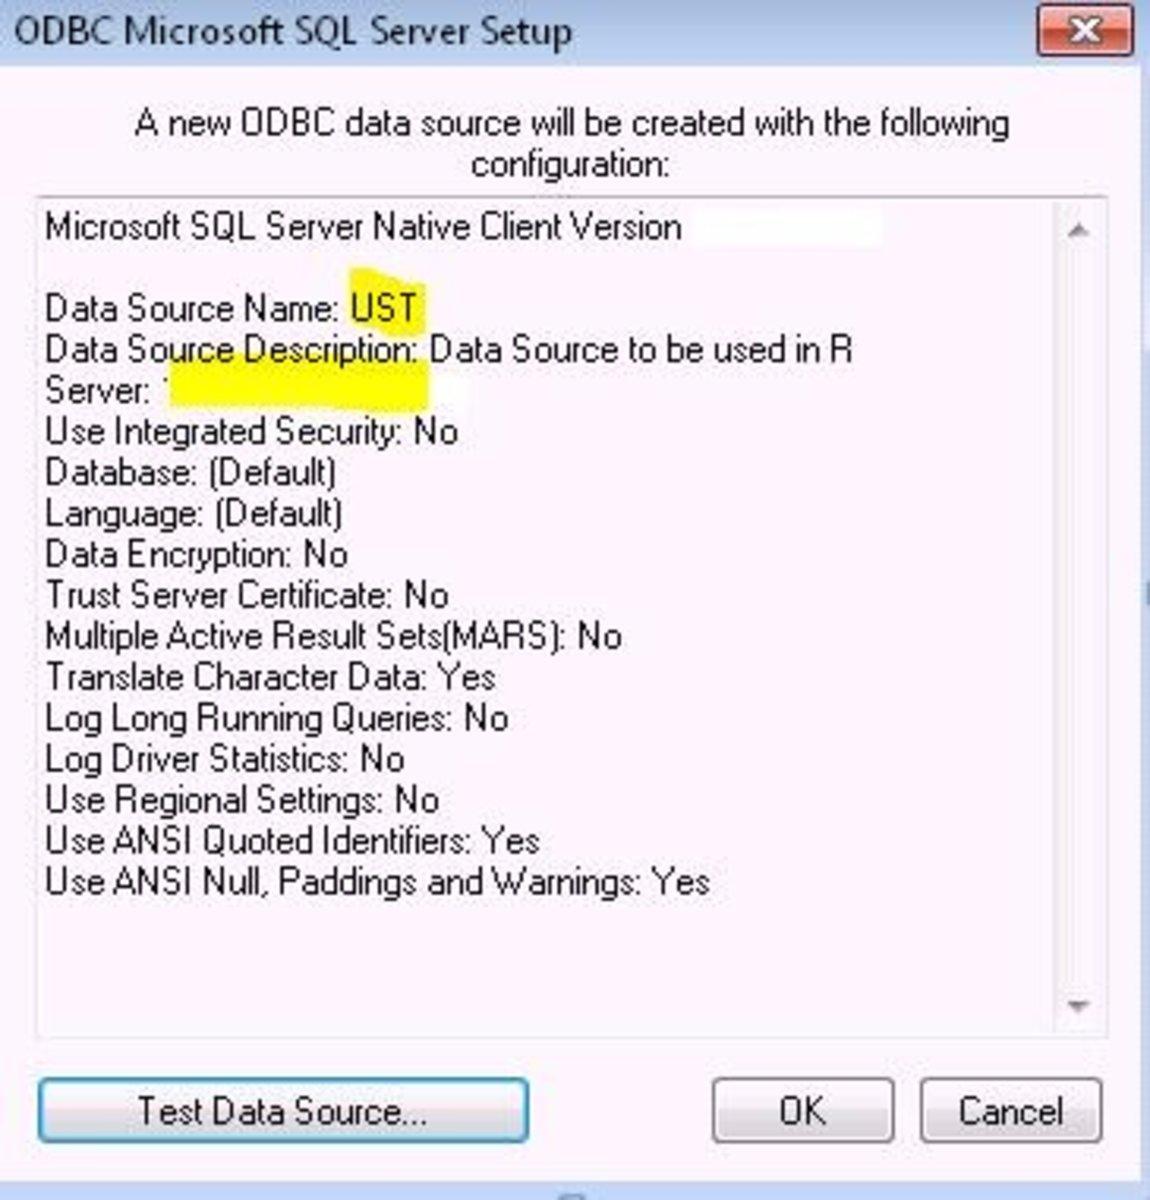 Test Data Source